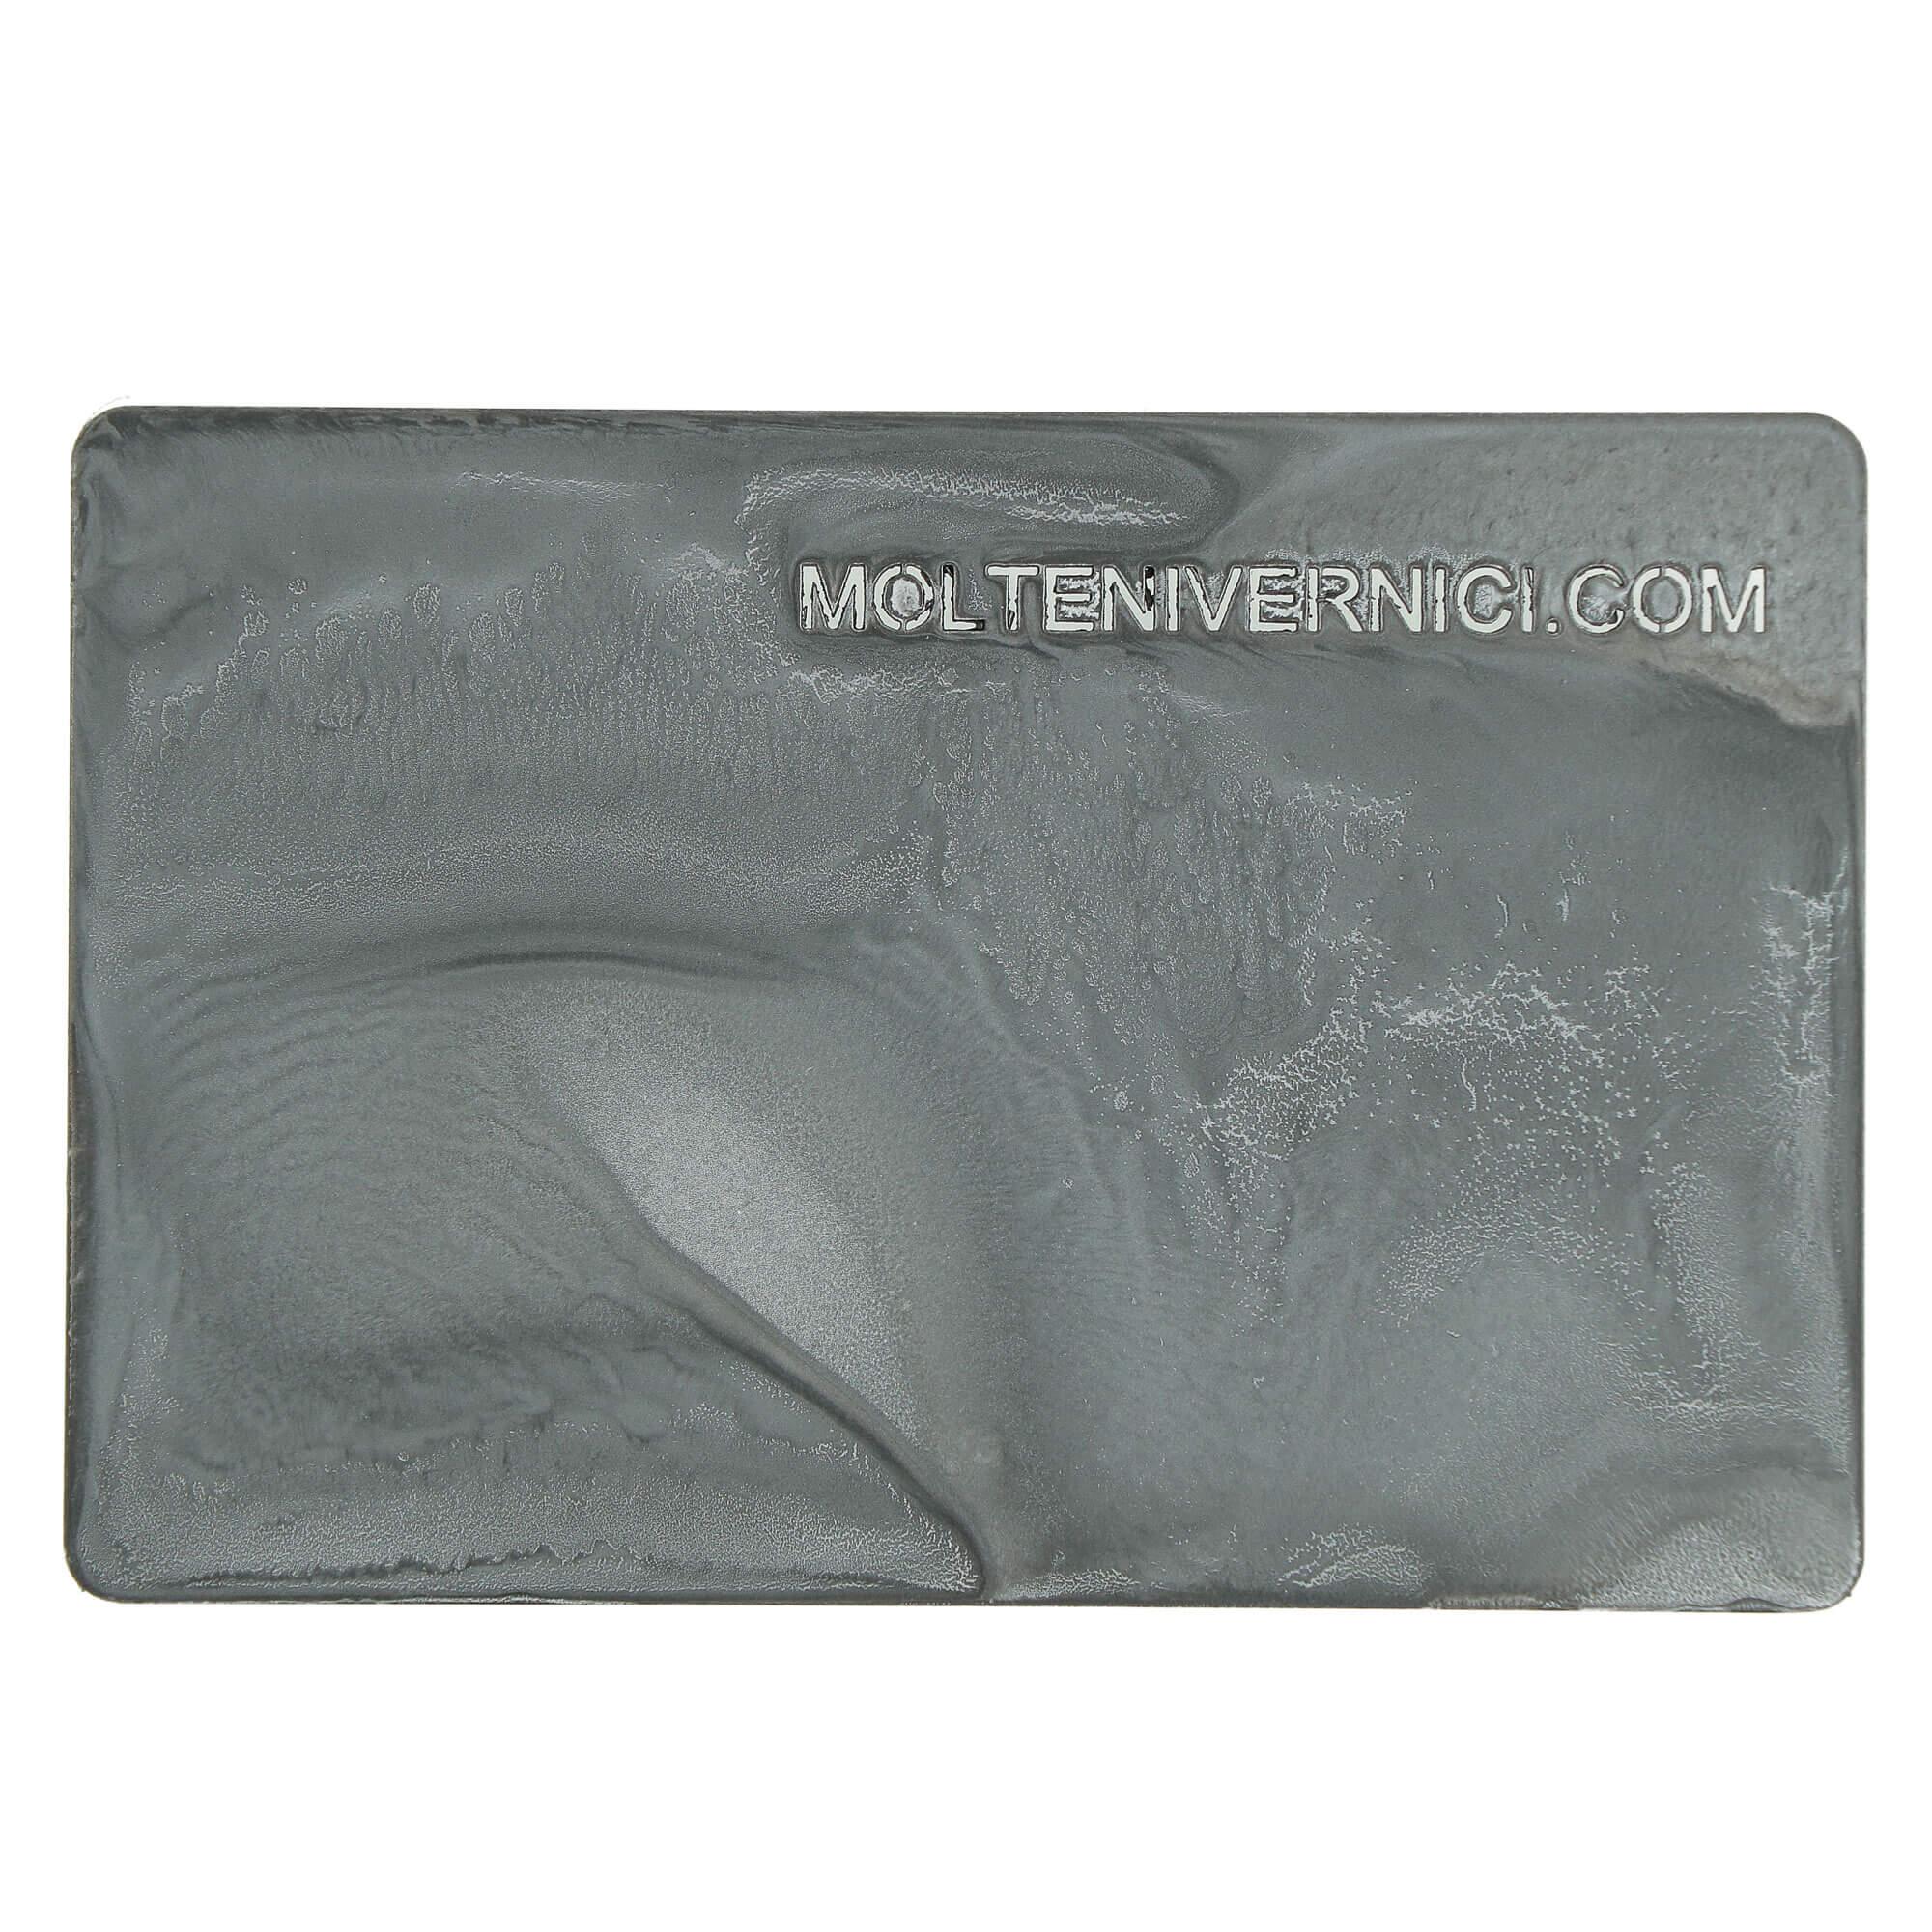 Materico Peltro Antico Oxidised Effect Varnish